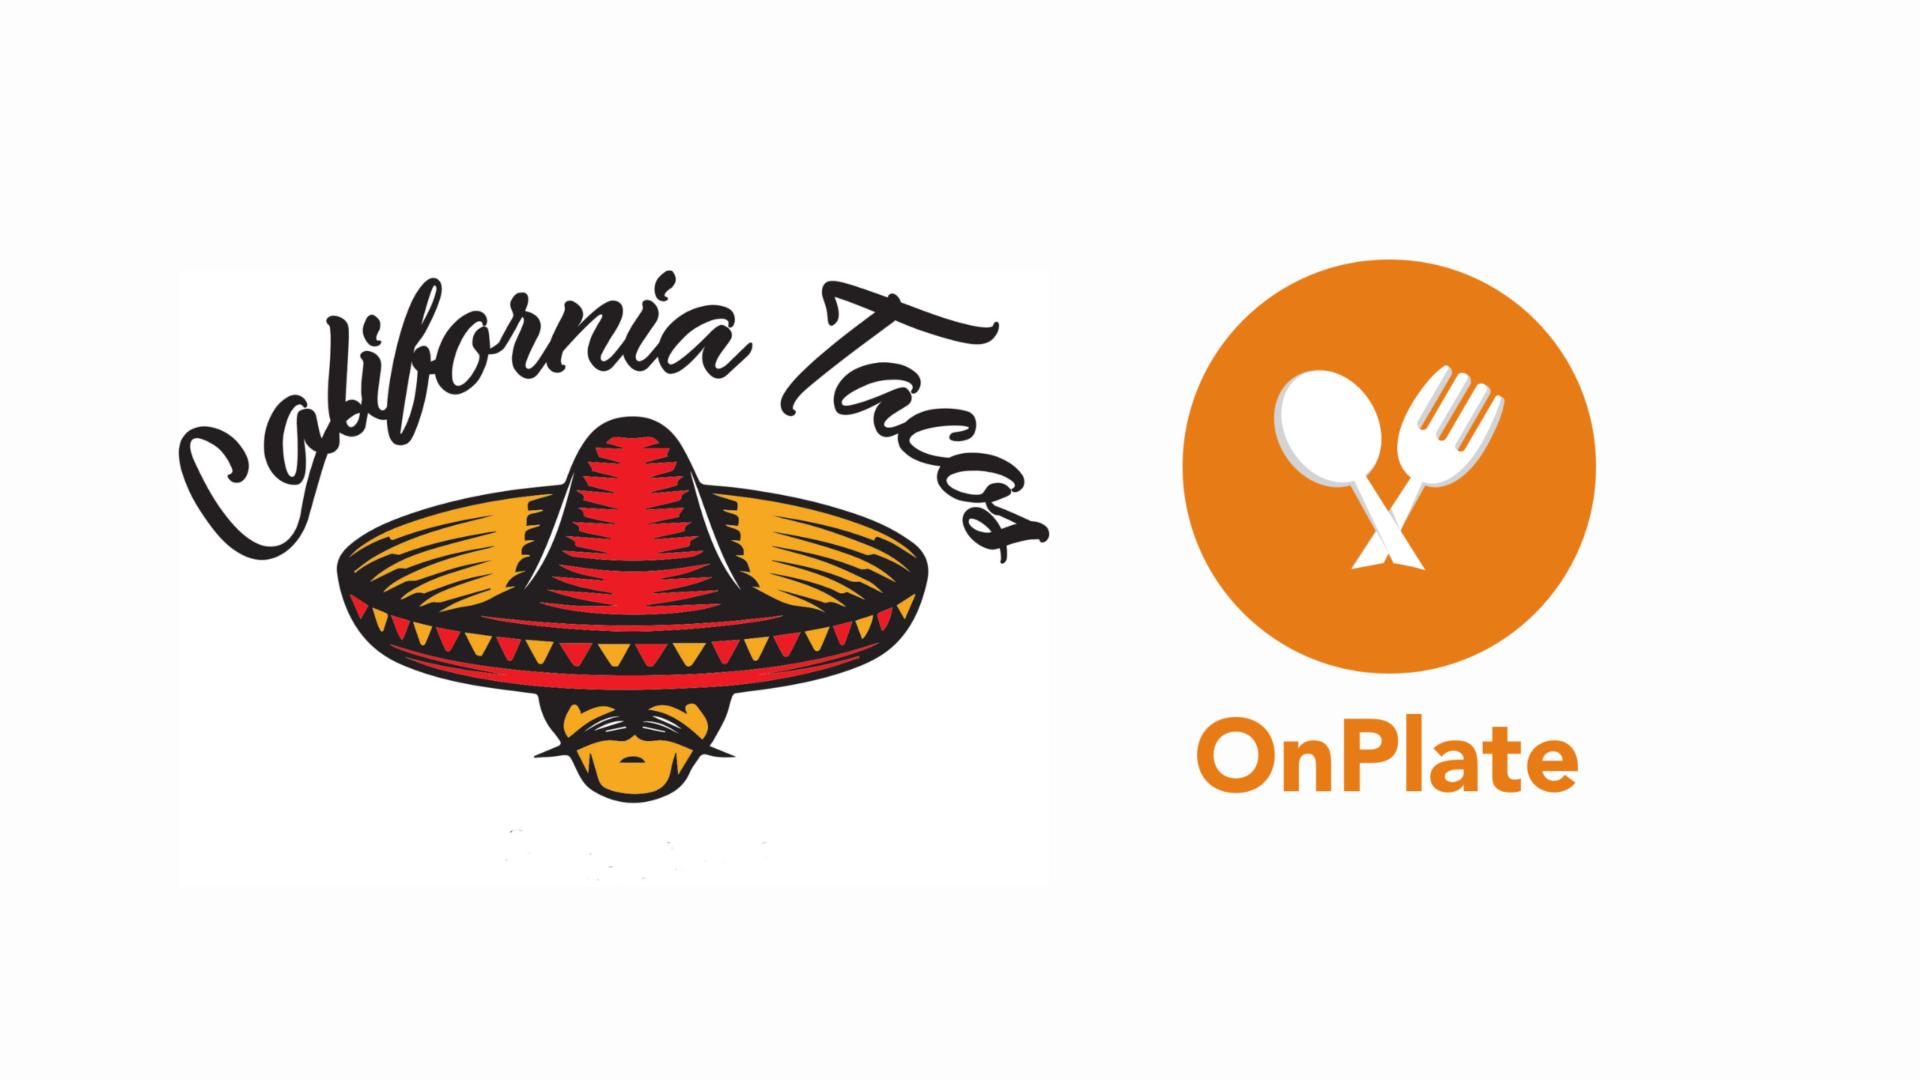 California Tacos, Inc. Announces Plans to Acquire Onplate Mobile App